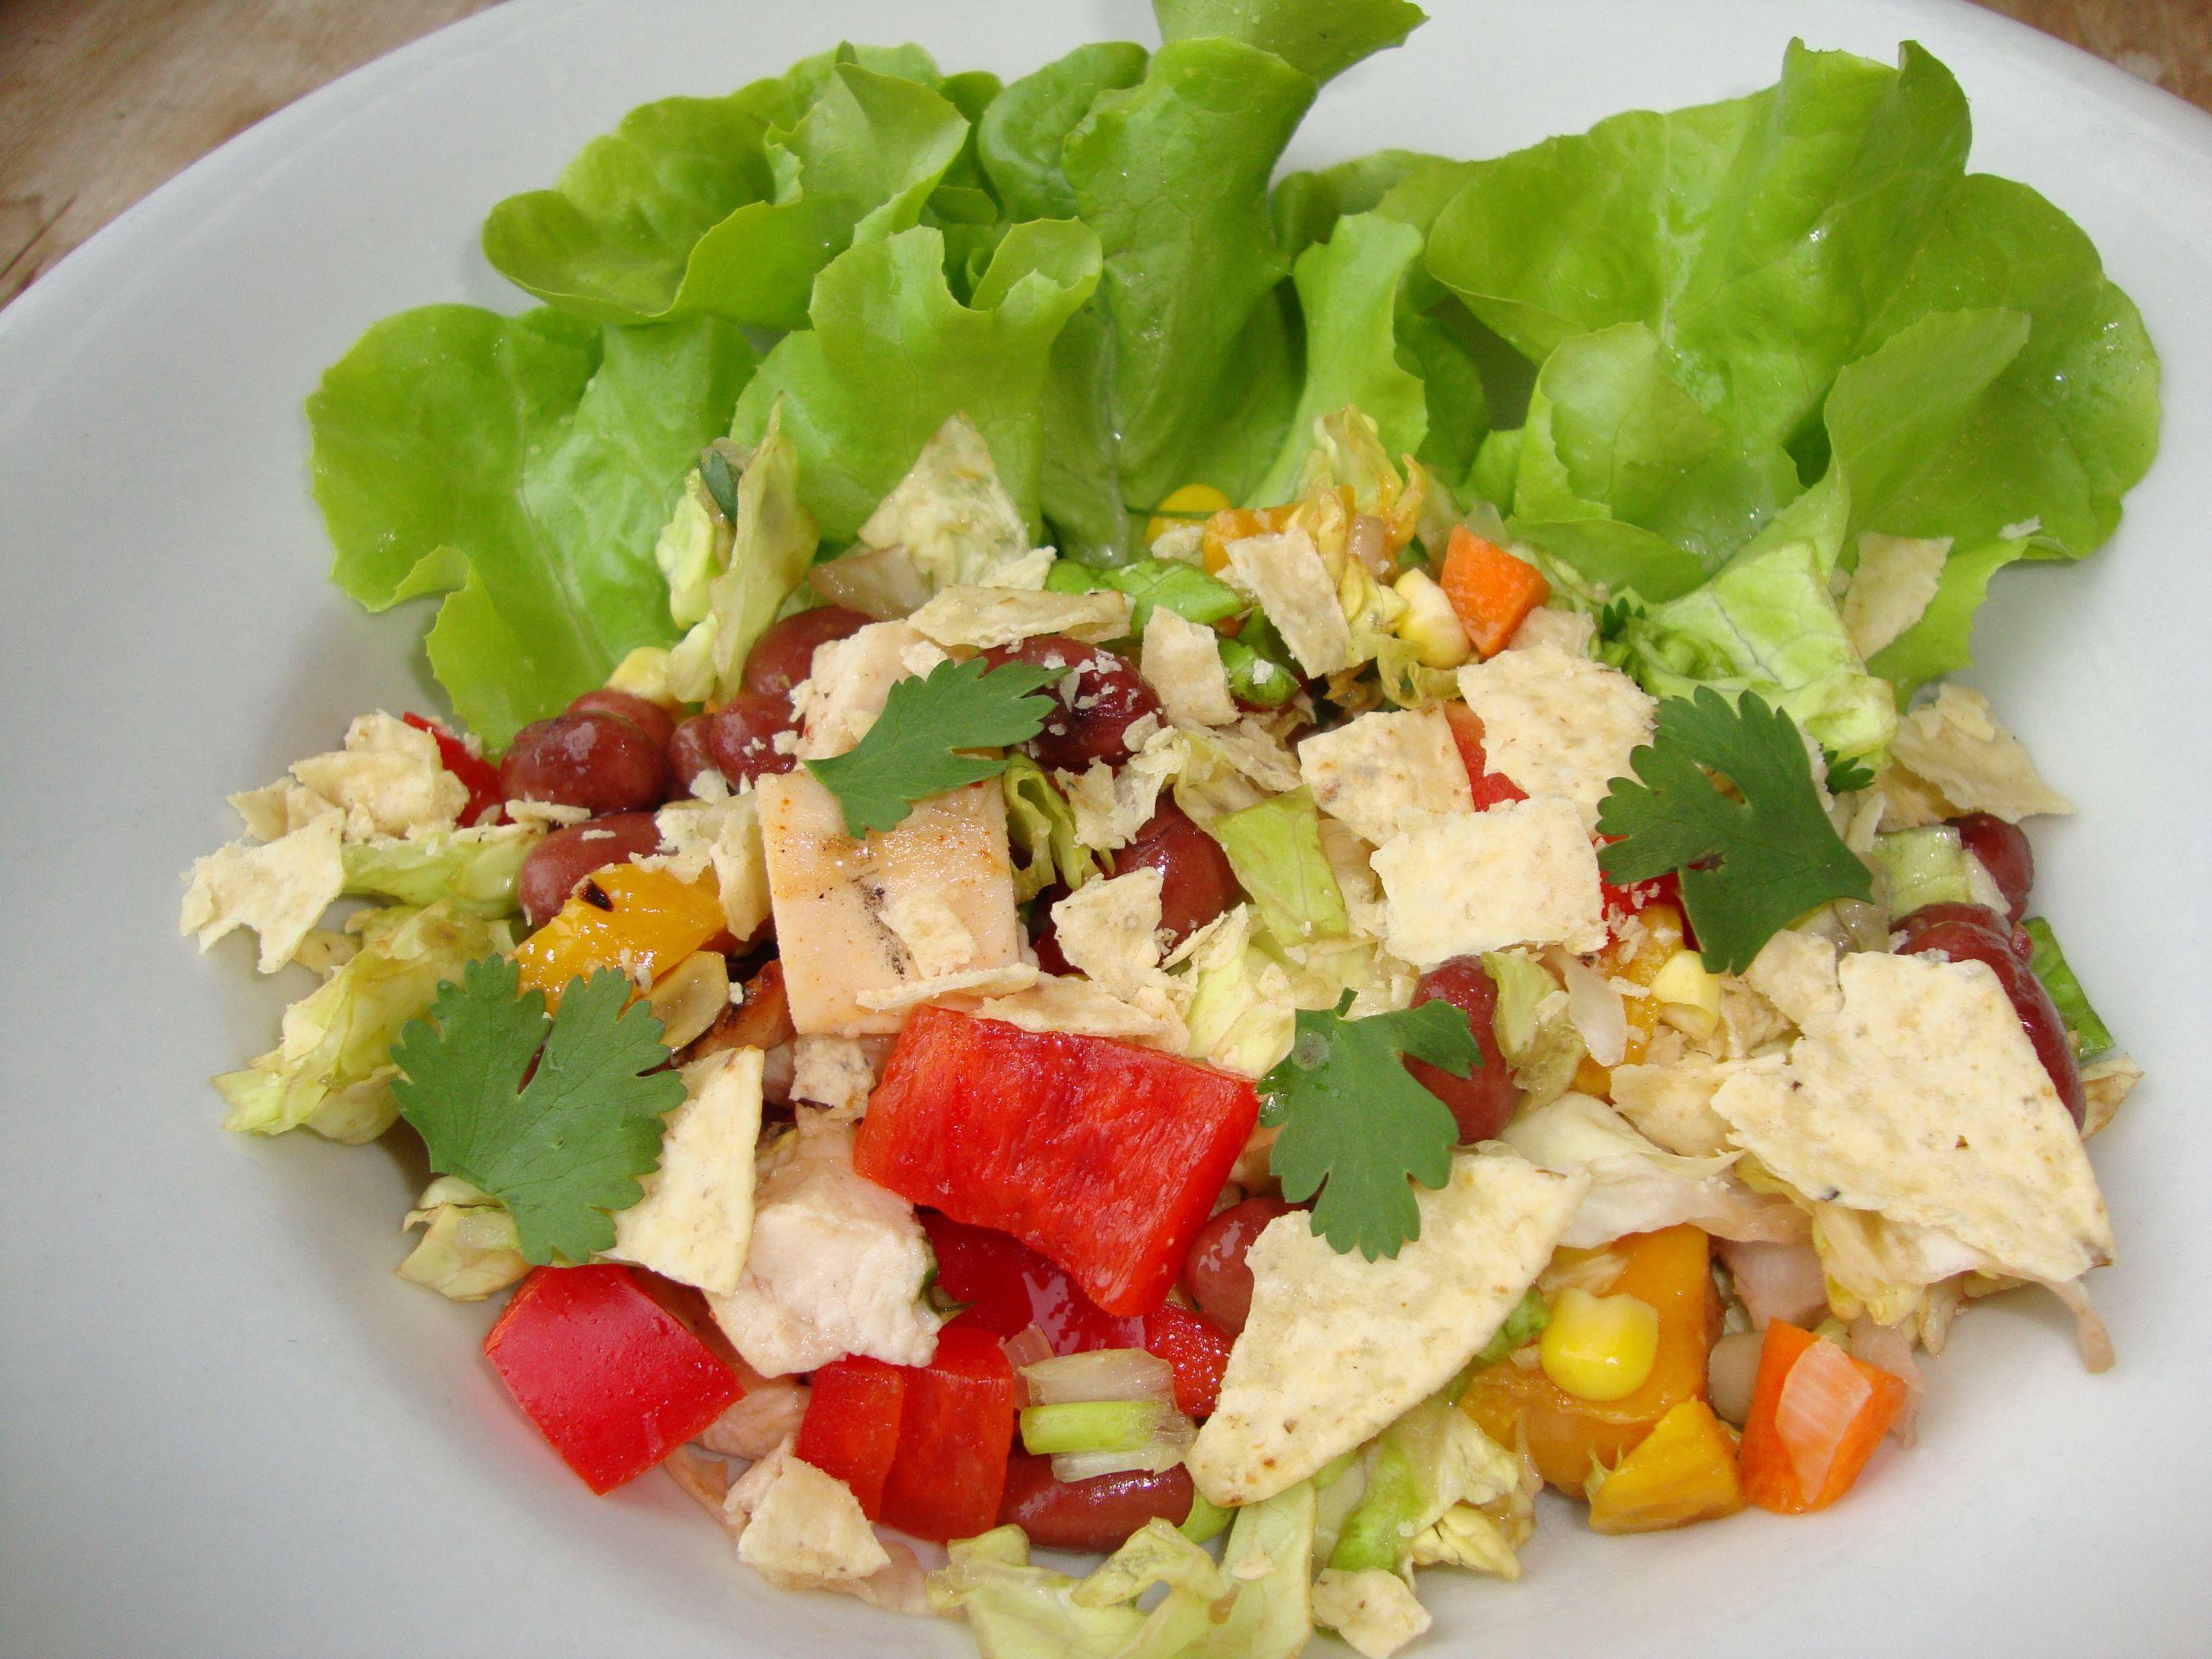 Chipotle Chicken Salad  Chipotle Chicken Taco Salad Real Food Real Deals